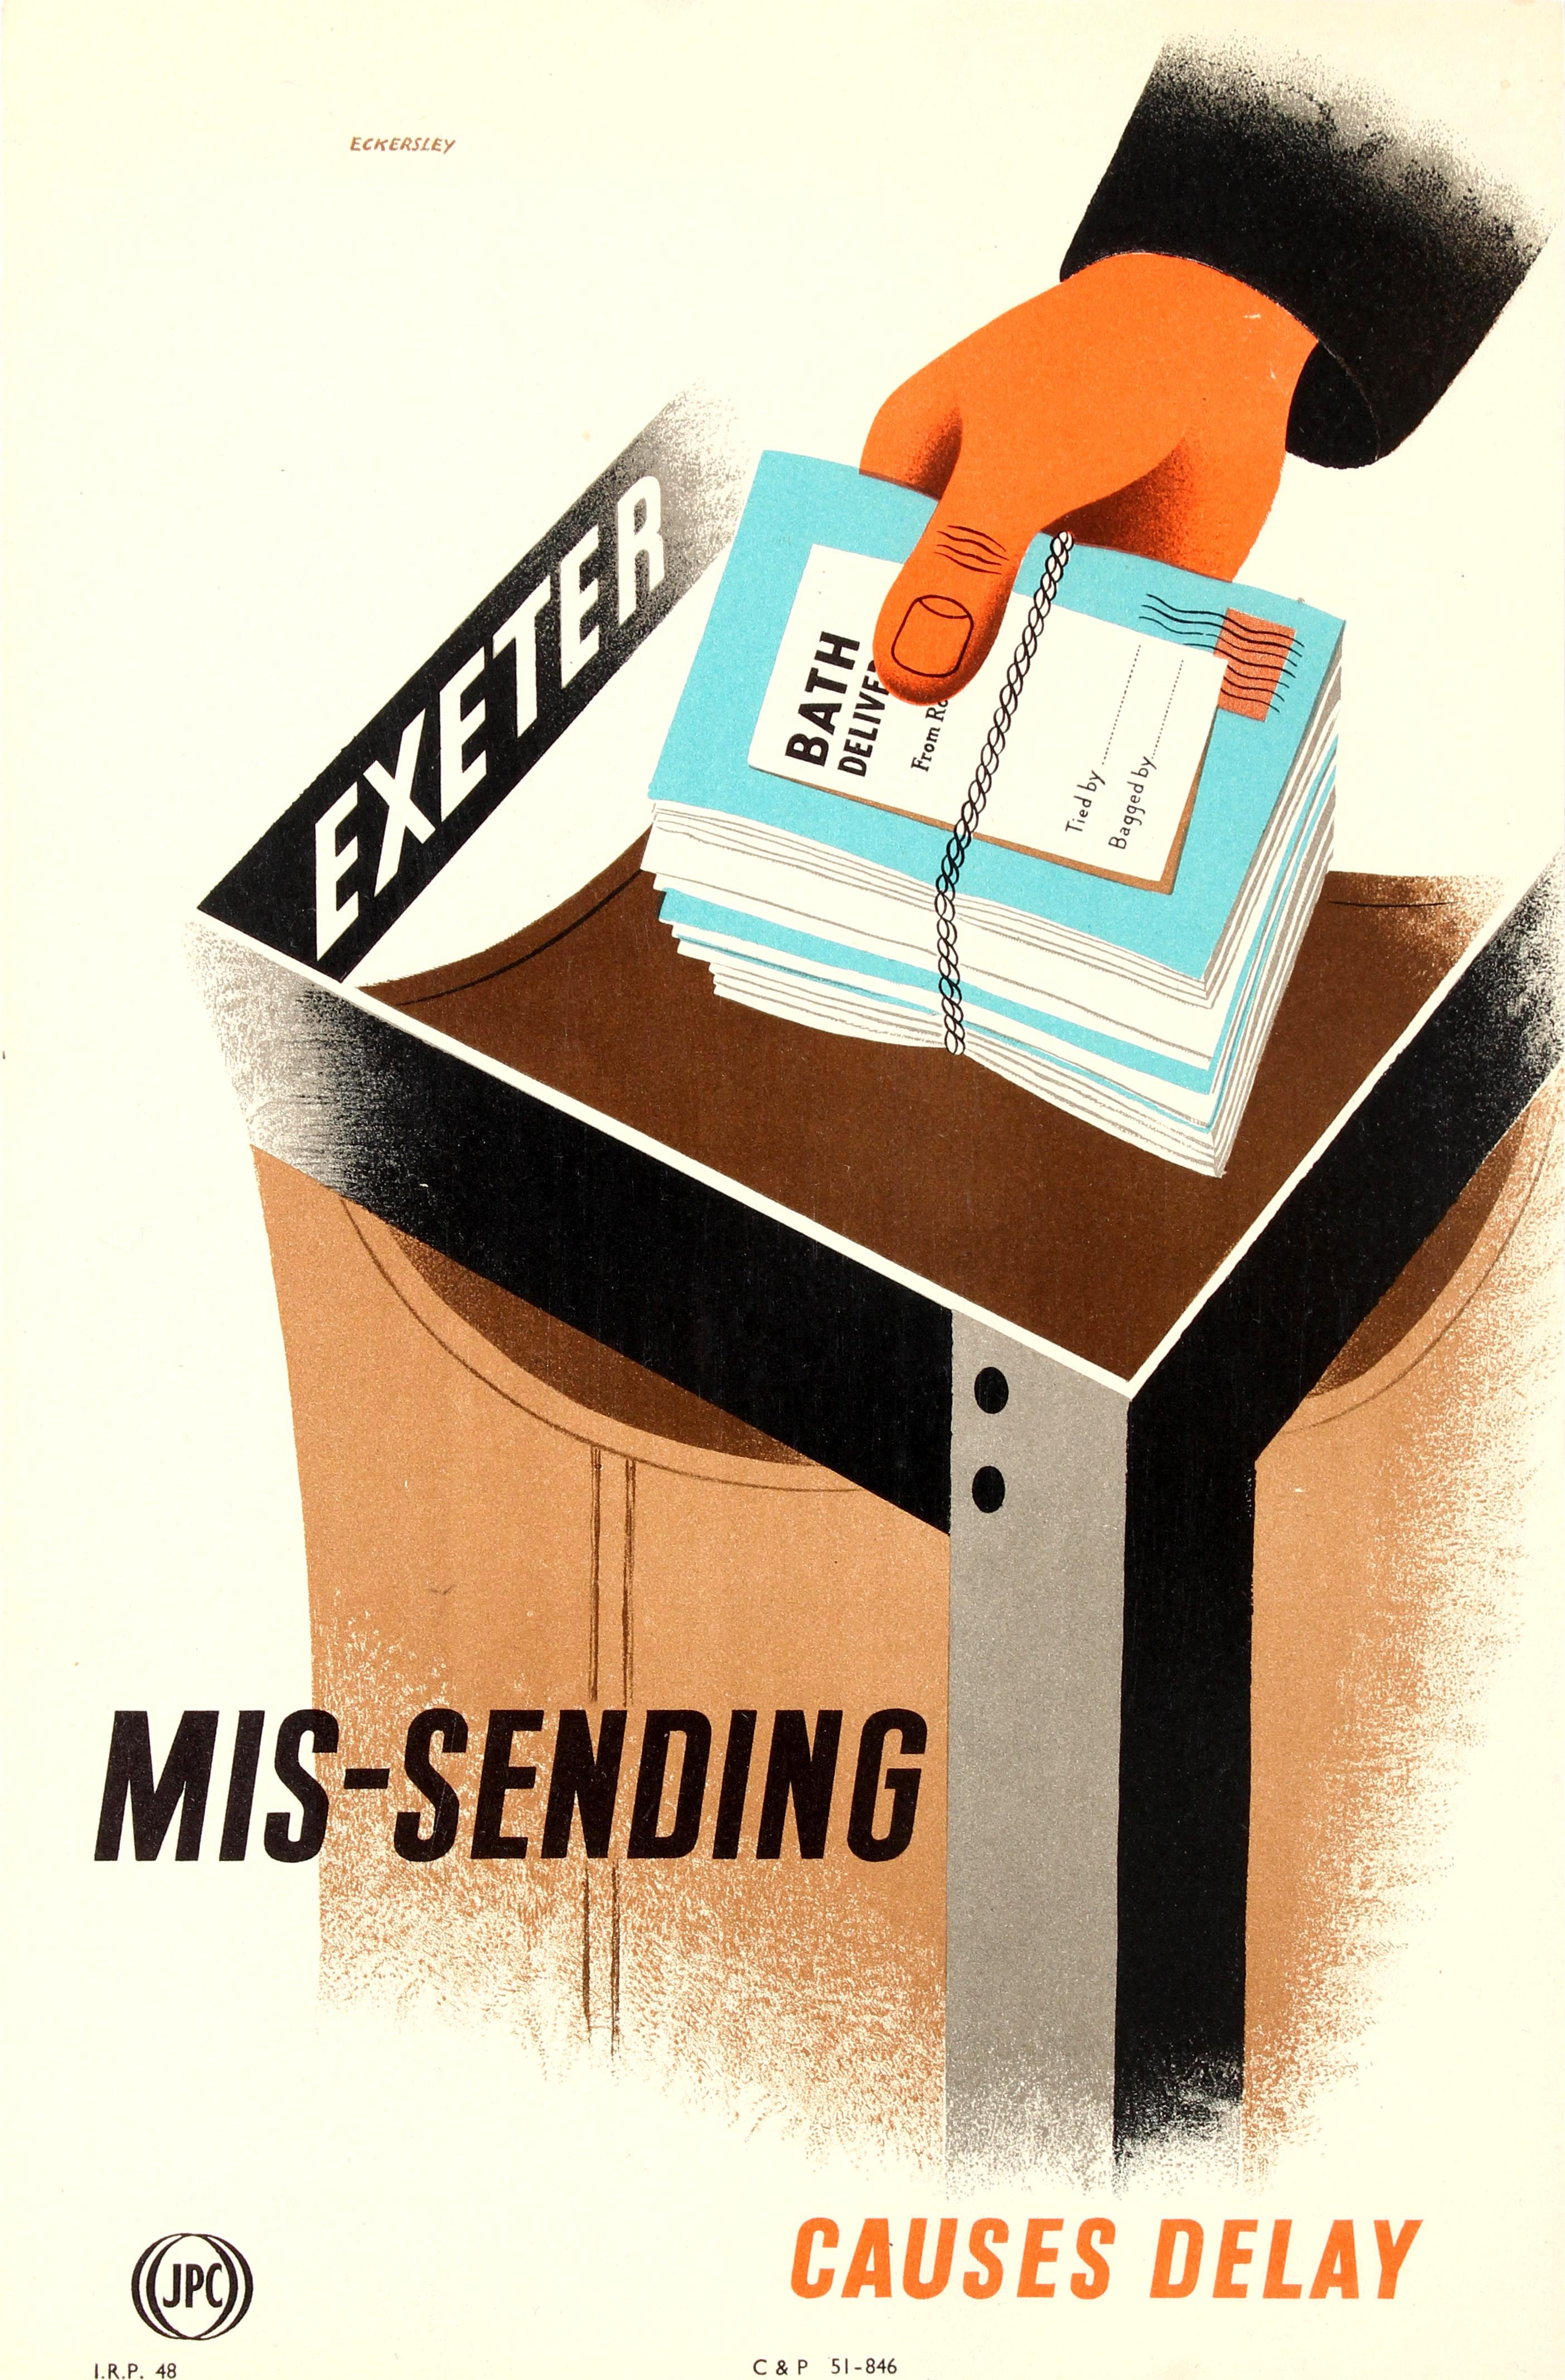 Lot 61 - Propaganda Poster Missending Delay GPO Midcentury Tom Eckersley